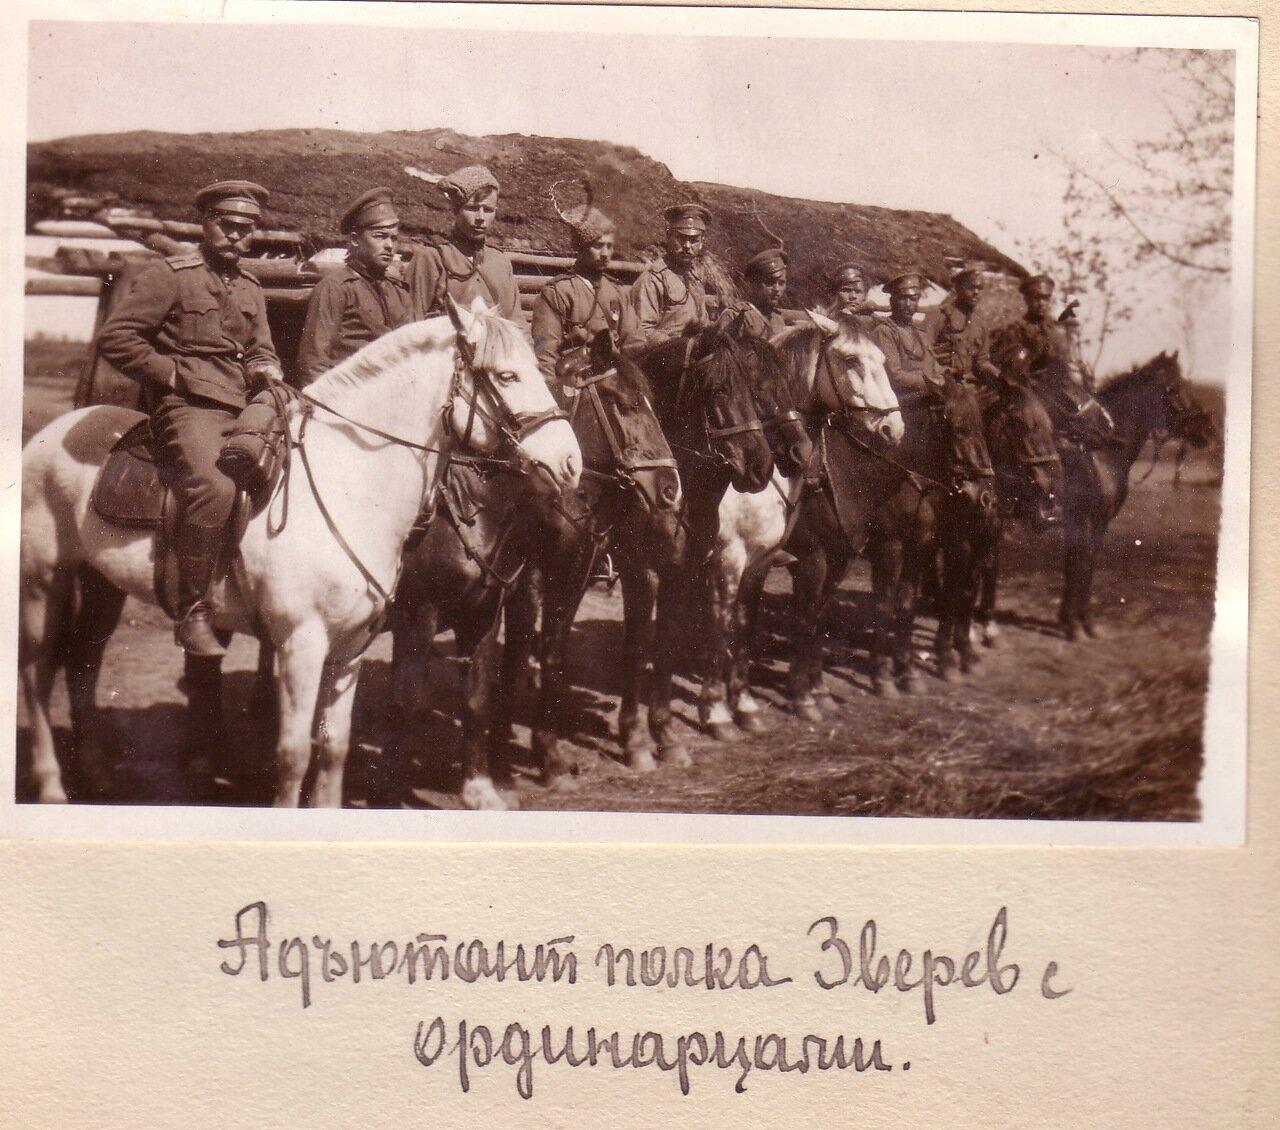 Адьютант полка Зверев с ординарцами